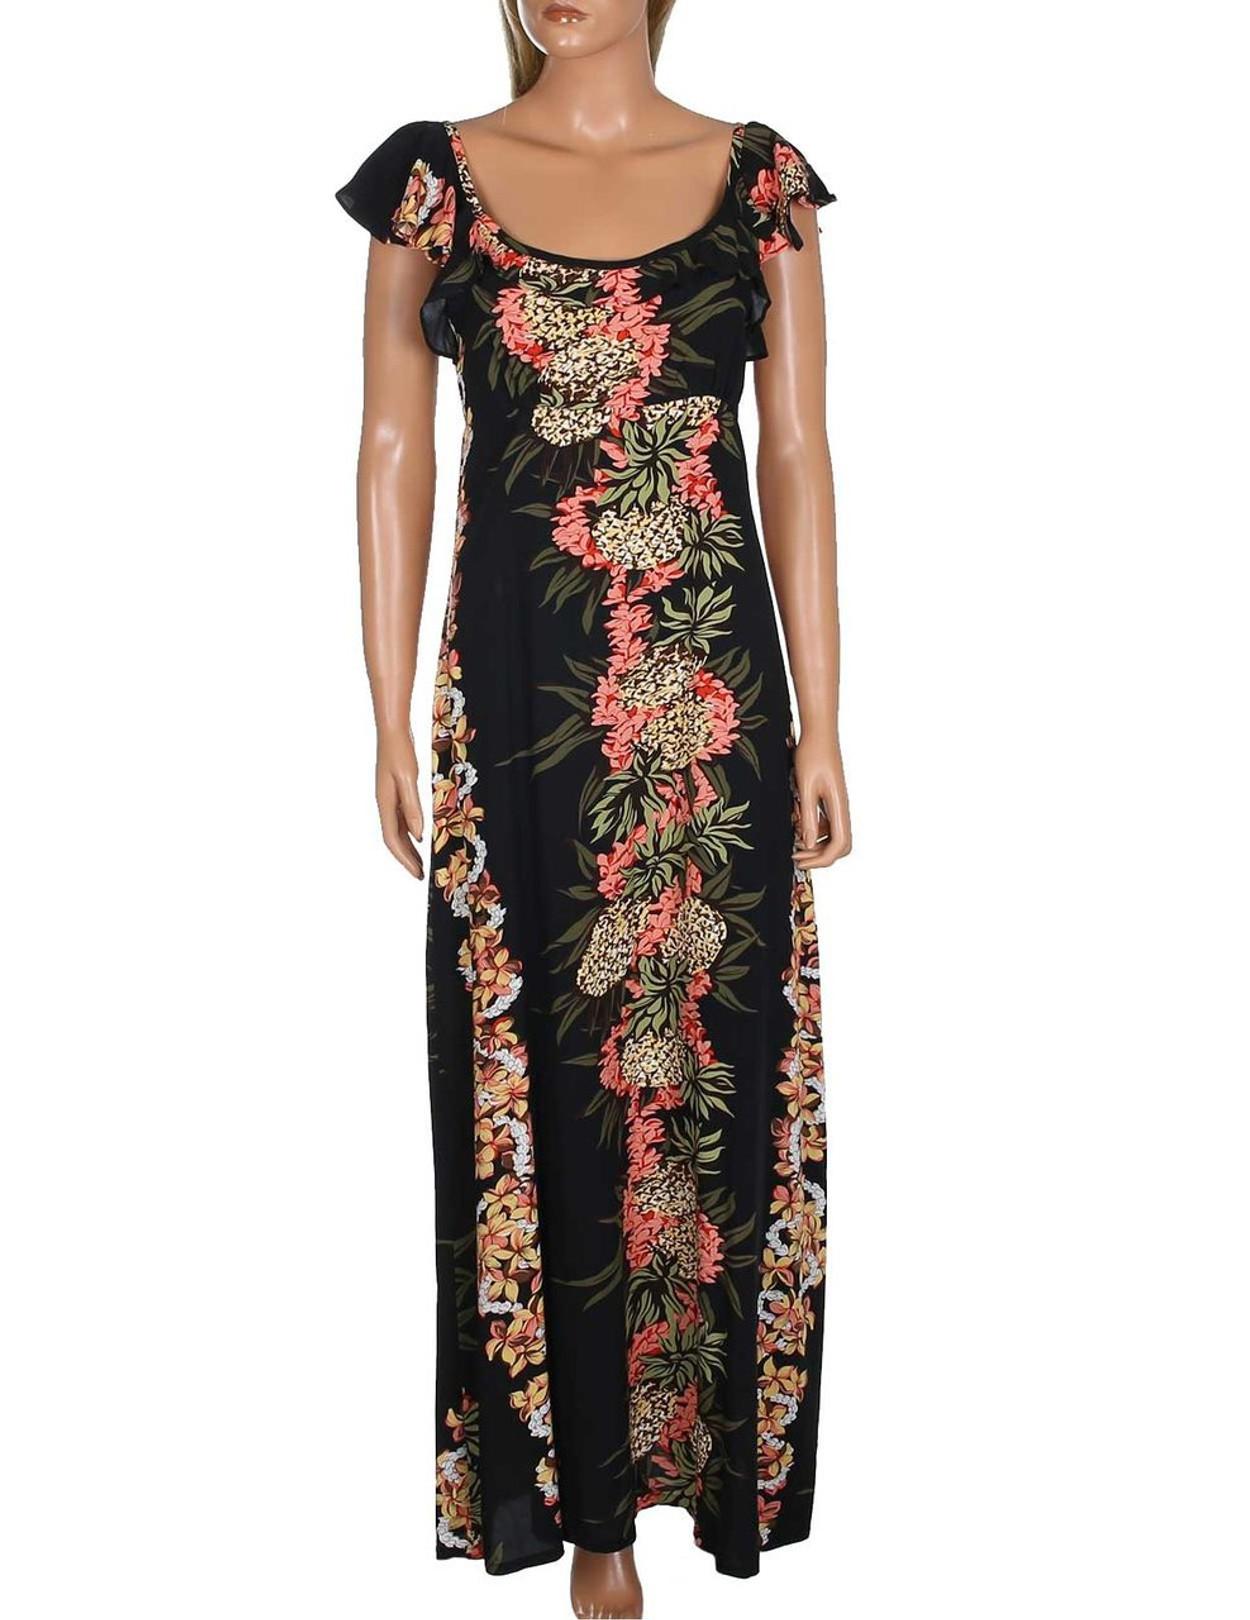 8219a982b52 Maxi Long Empire Dress Flutter Sleeve Pineapple Panel 100% Rayon Fabric  Long Maxi Dress Style